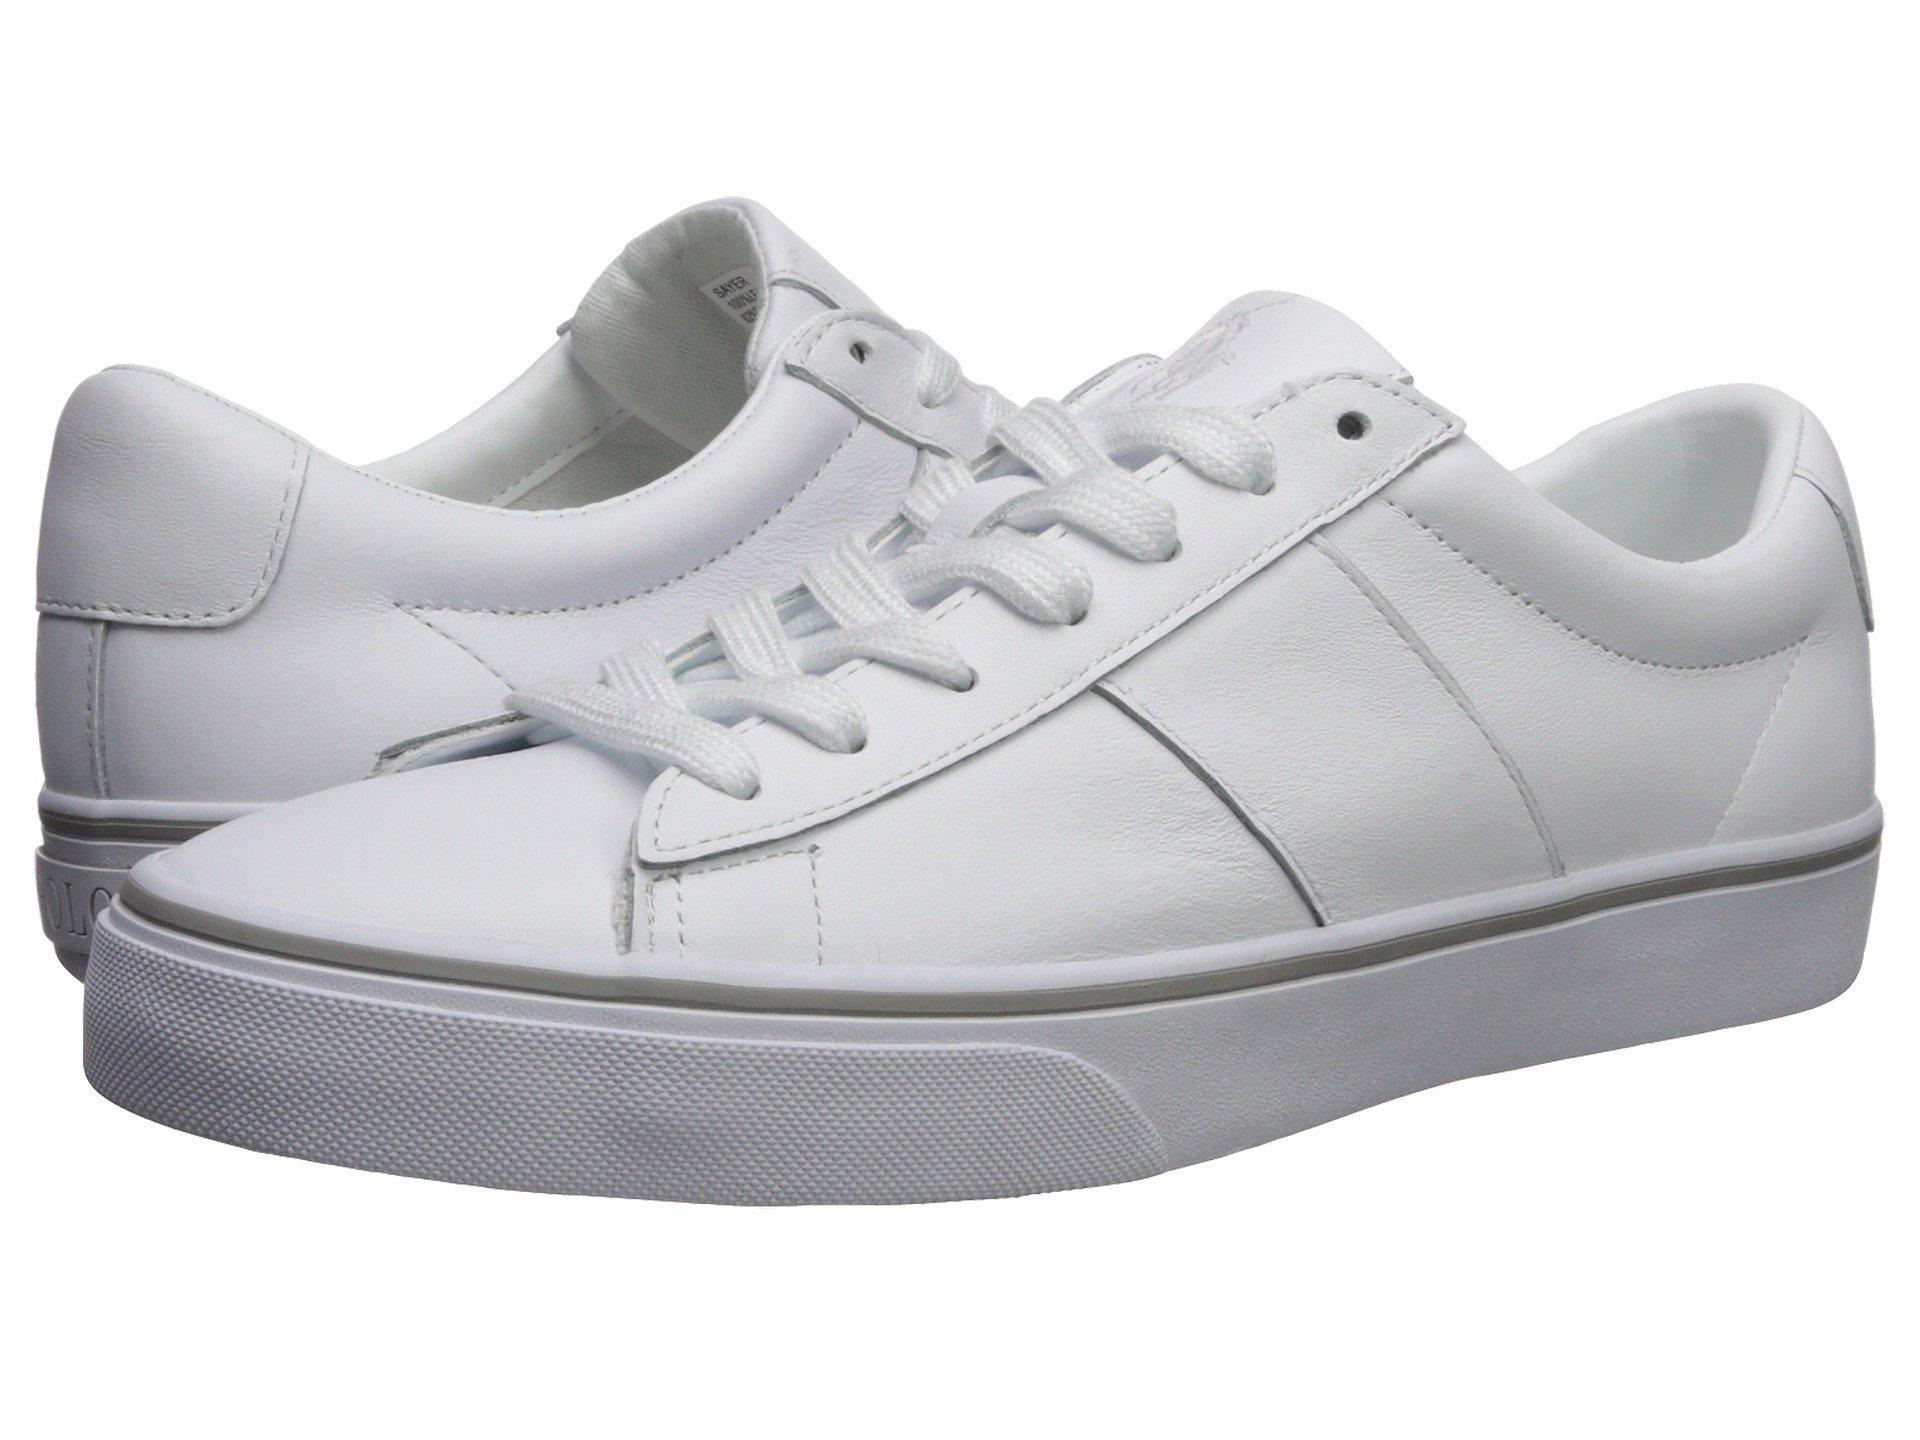 79b70f5848aa Lyst - Polo Ralph Lauren Sayer (ralph Lauren 2000 Red) Men s Shoes ...